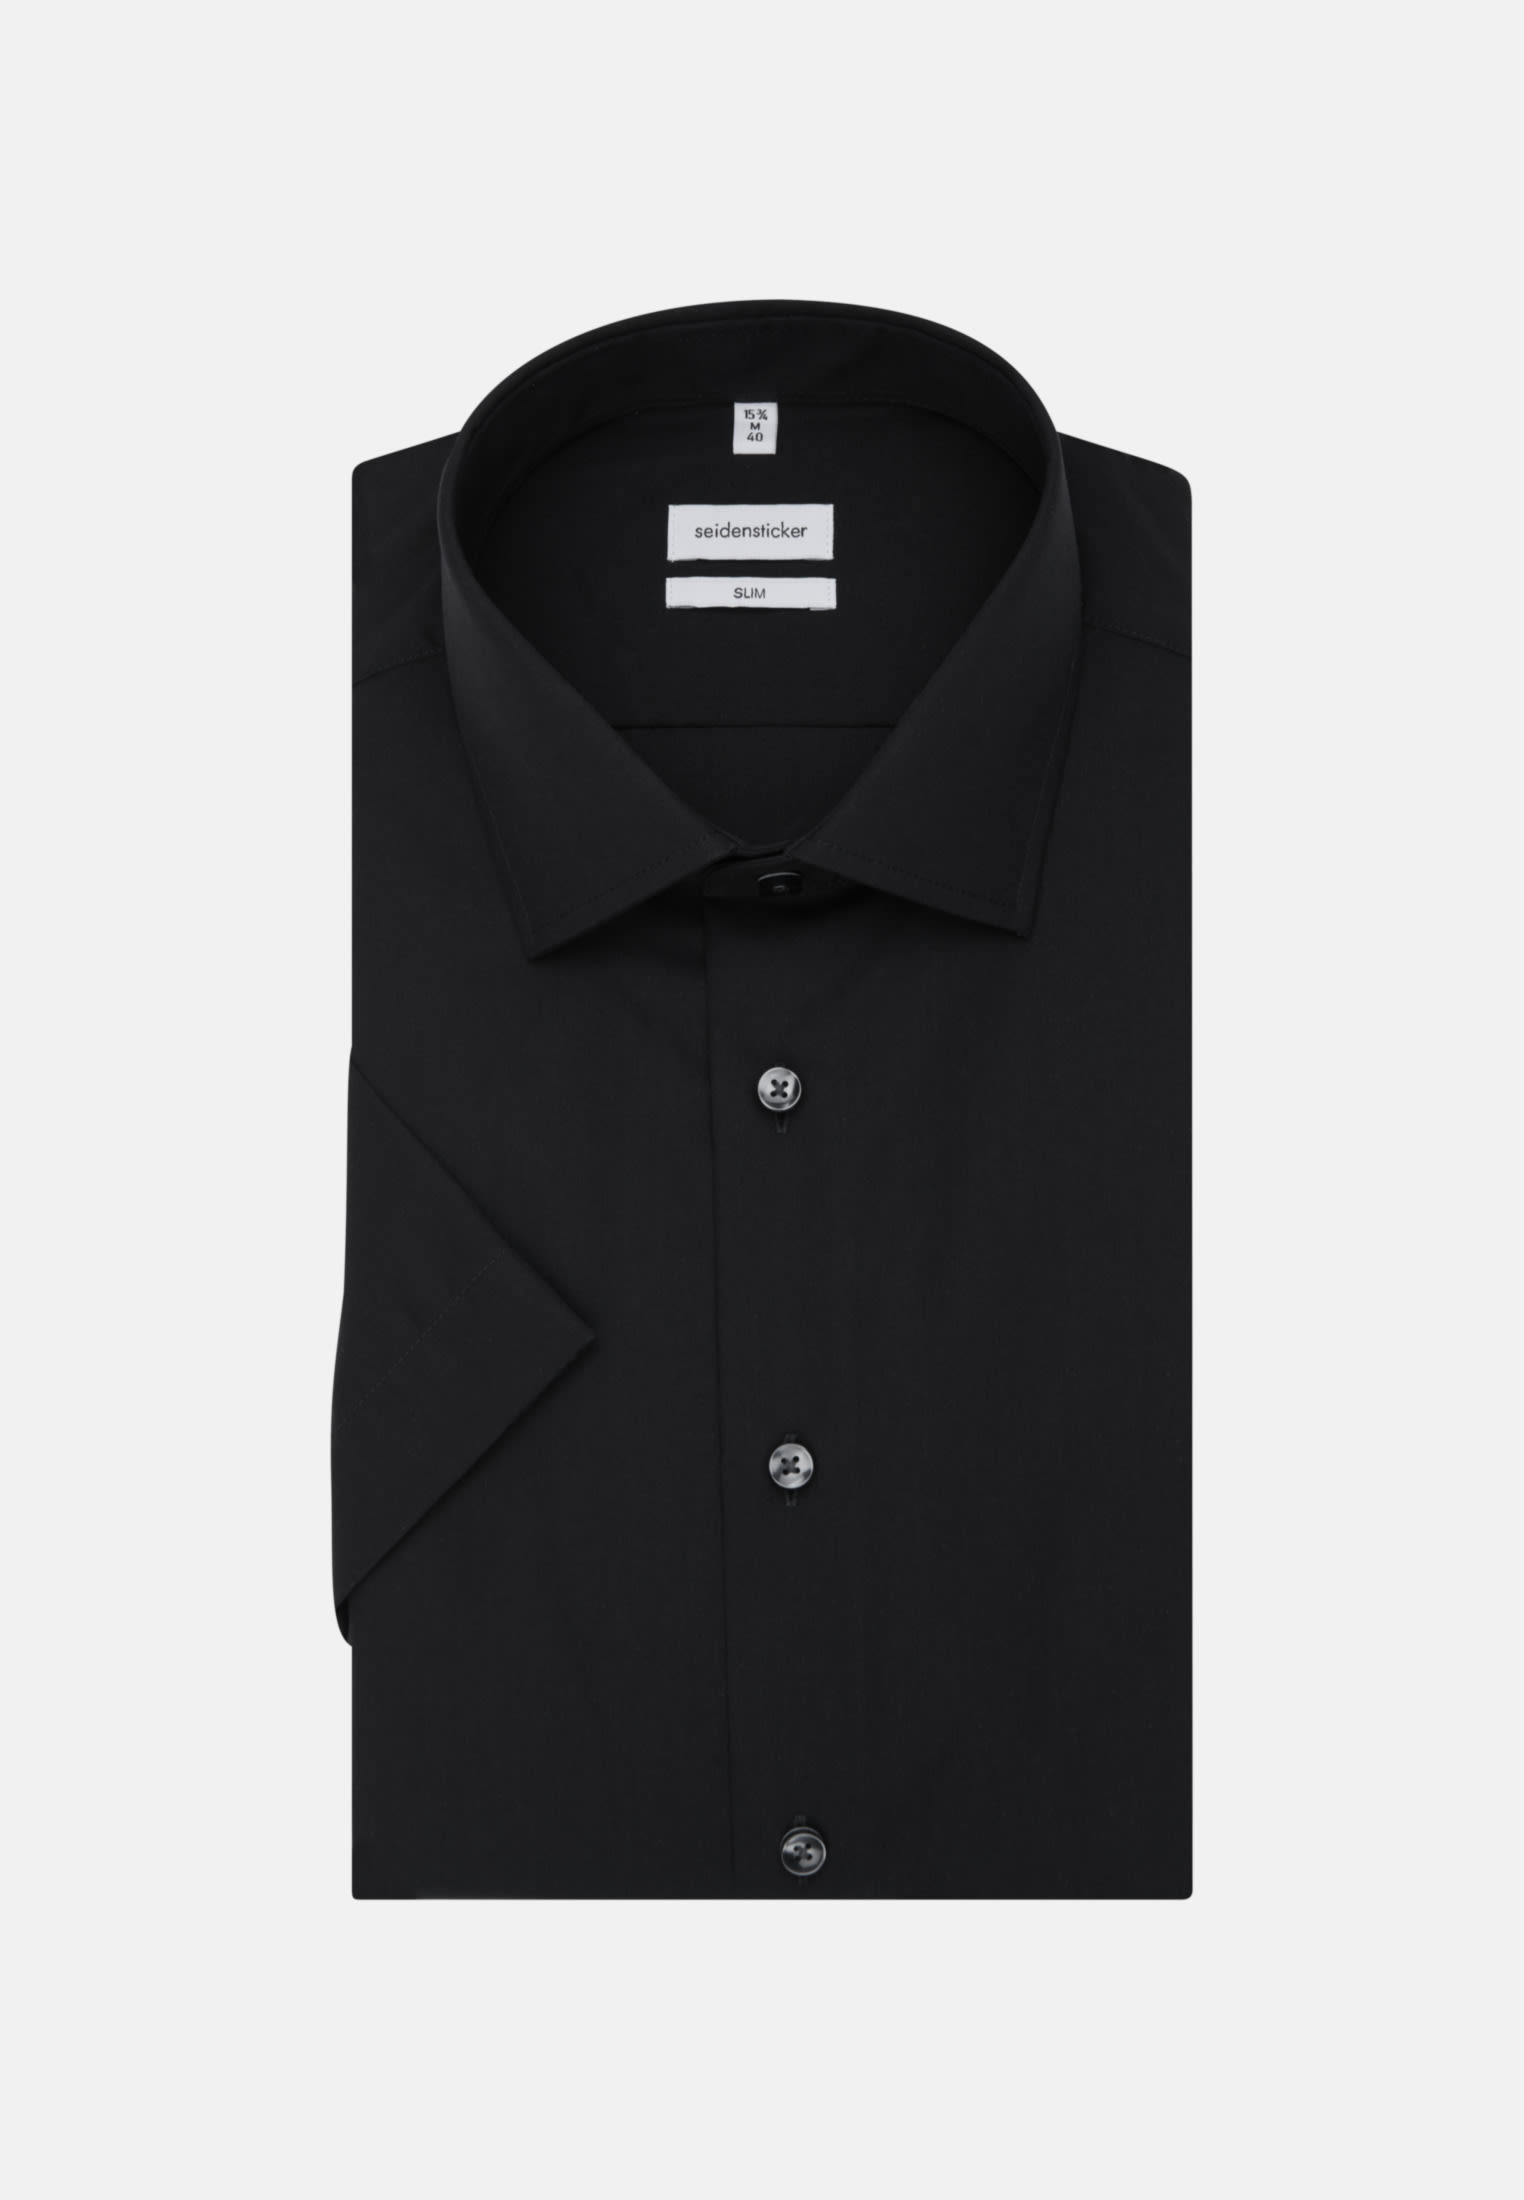 Seidensticker Schwarze Rose Hemd Tailored Fit Schwarz Halbarm Popeline Kent